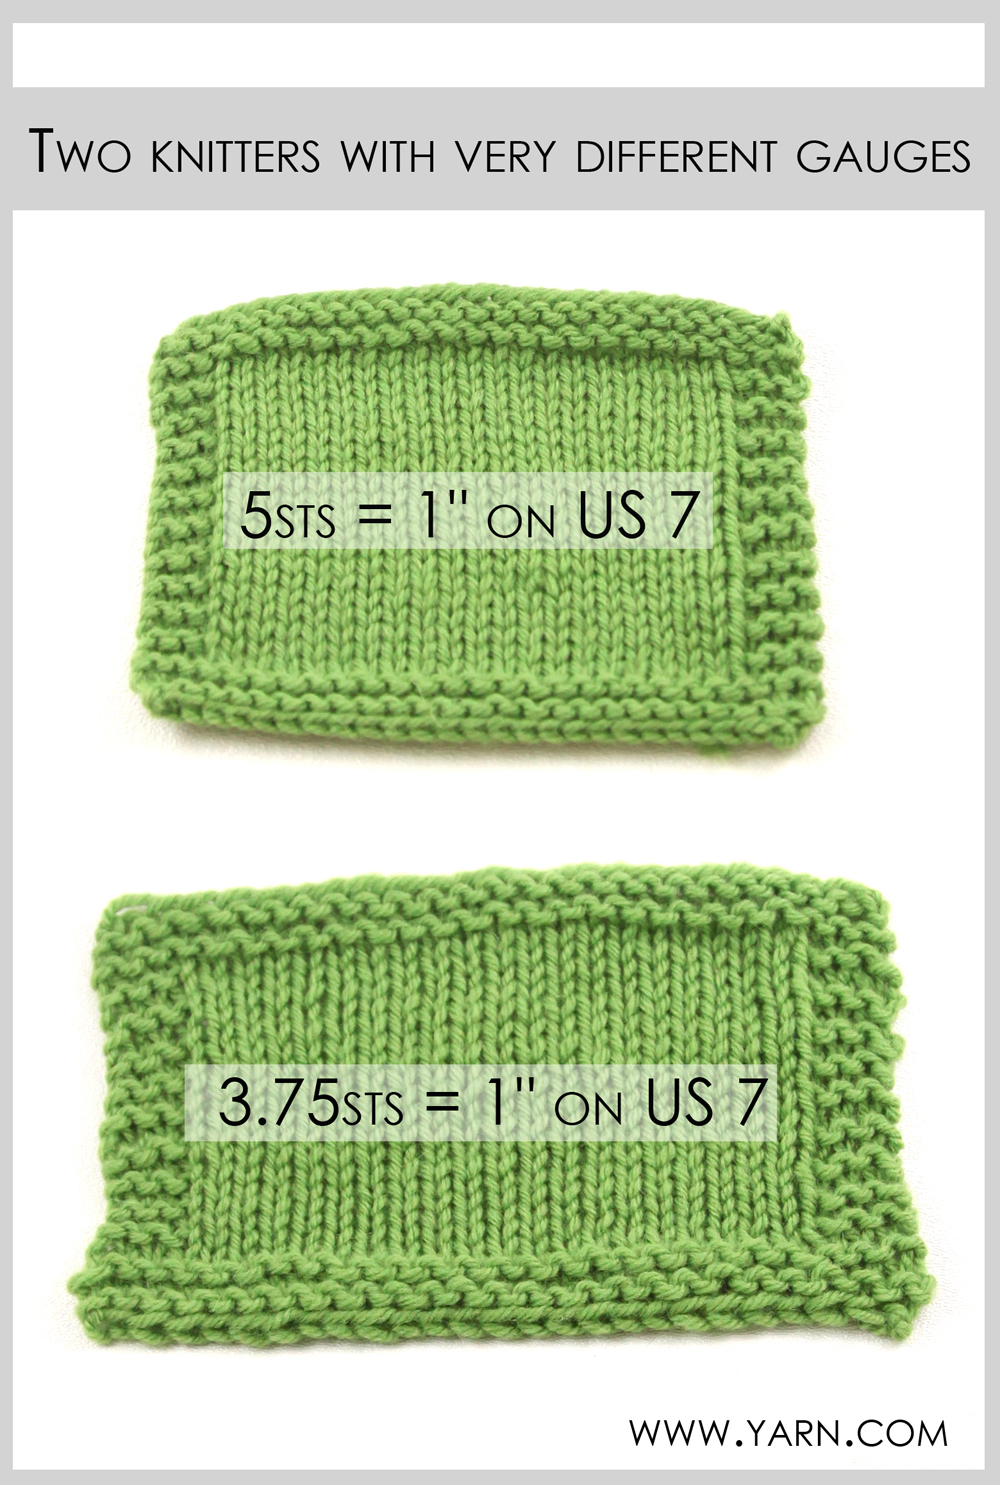 Knitting Gauge Definition : Webs yarn store knitting patterns tattoo design bild